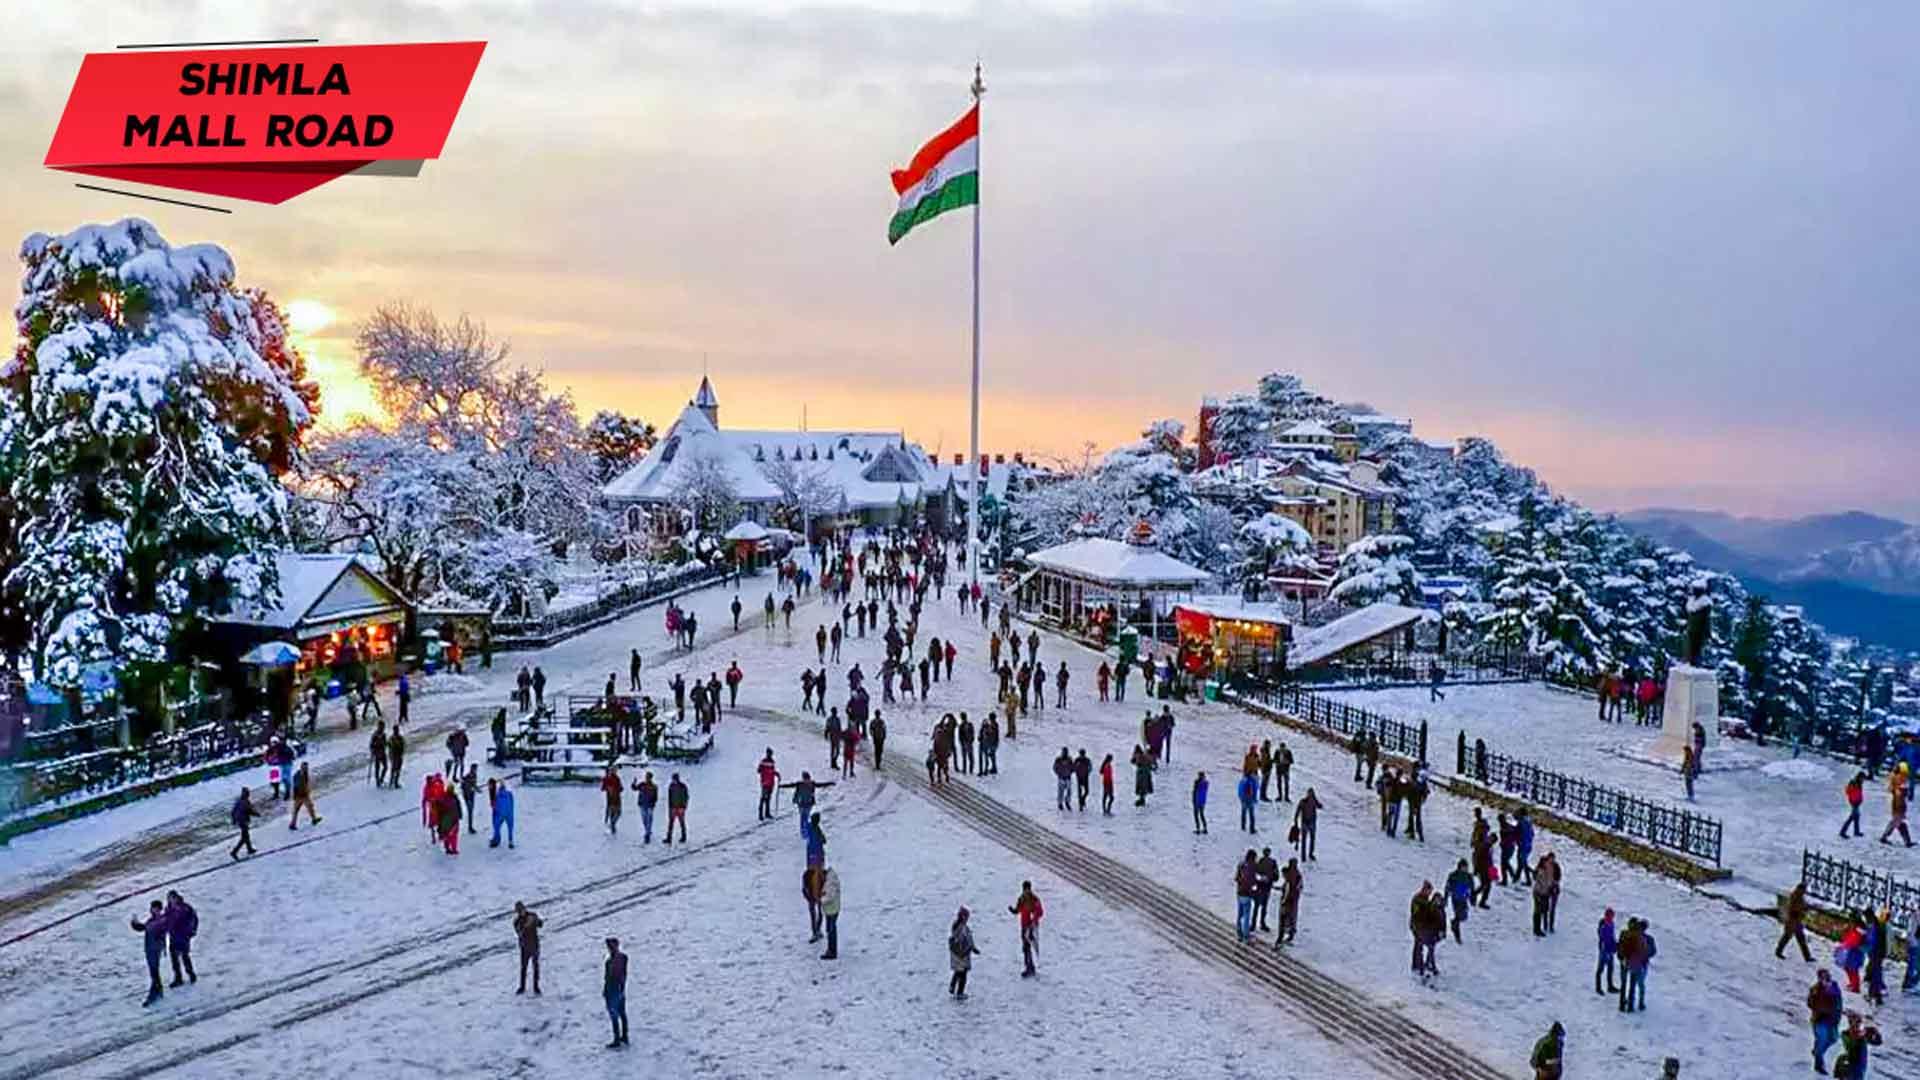 Delhi to Shimla Tour